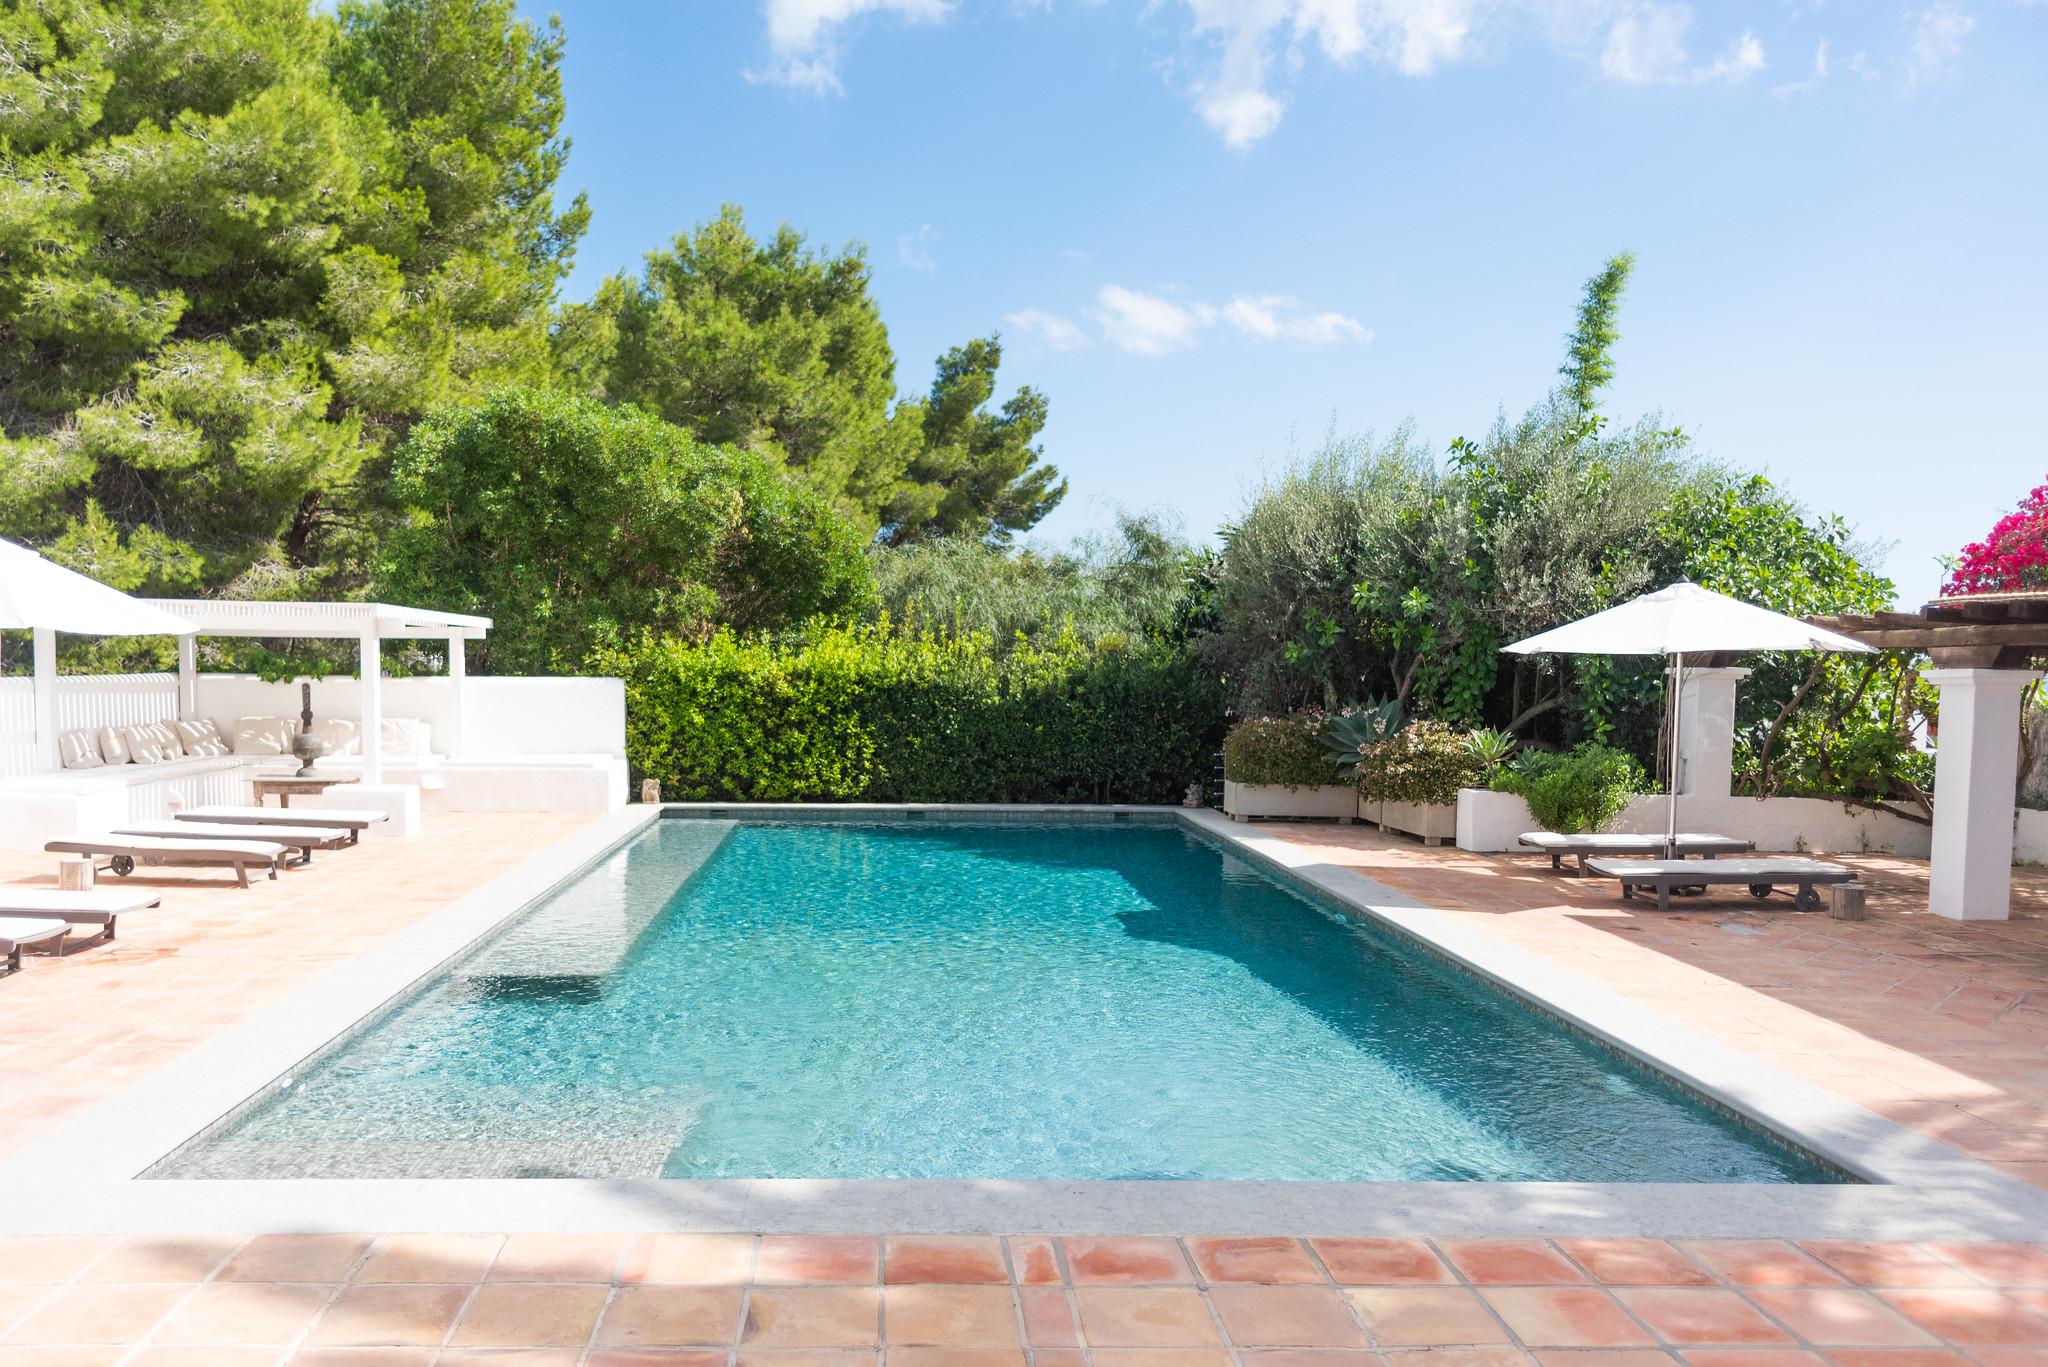 https://www.white-ibiza.com/wp-content/uploads/2020/05/white-ibiza-villas-can-lyra-exterior-pool-length.jpg